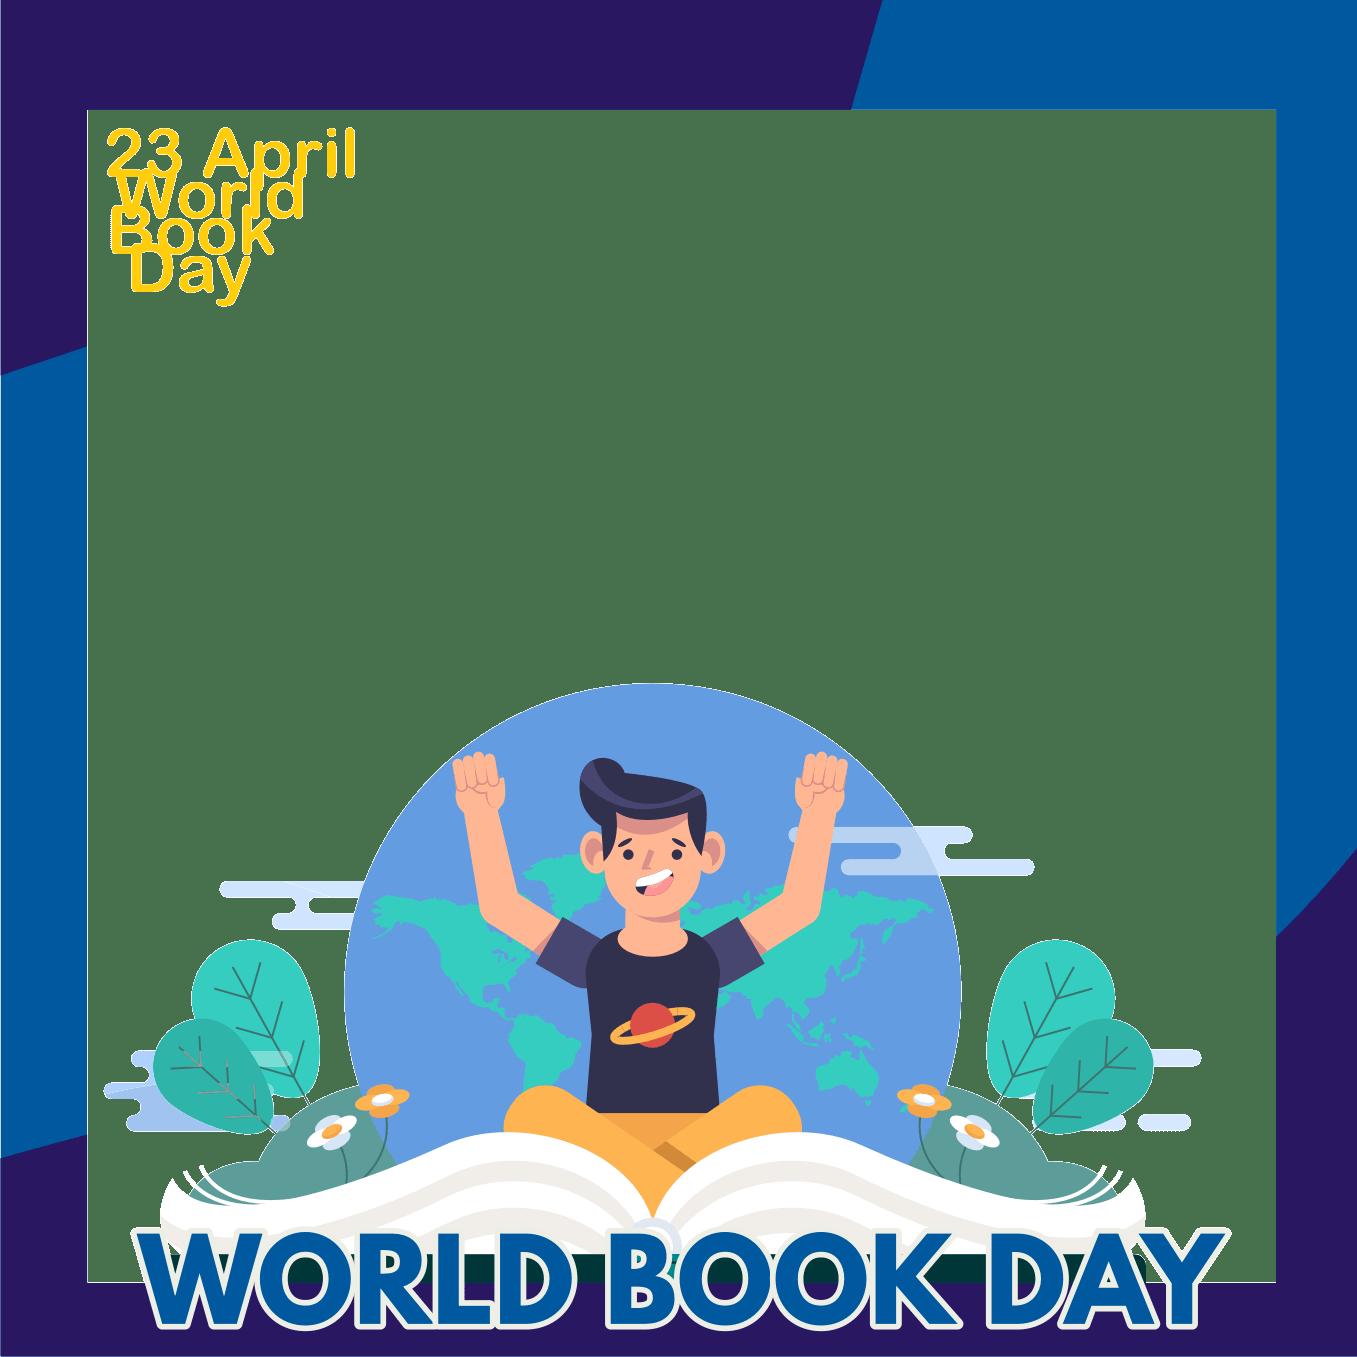 World Book Day campaigns